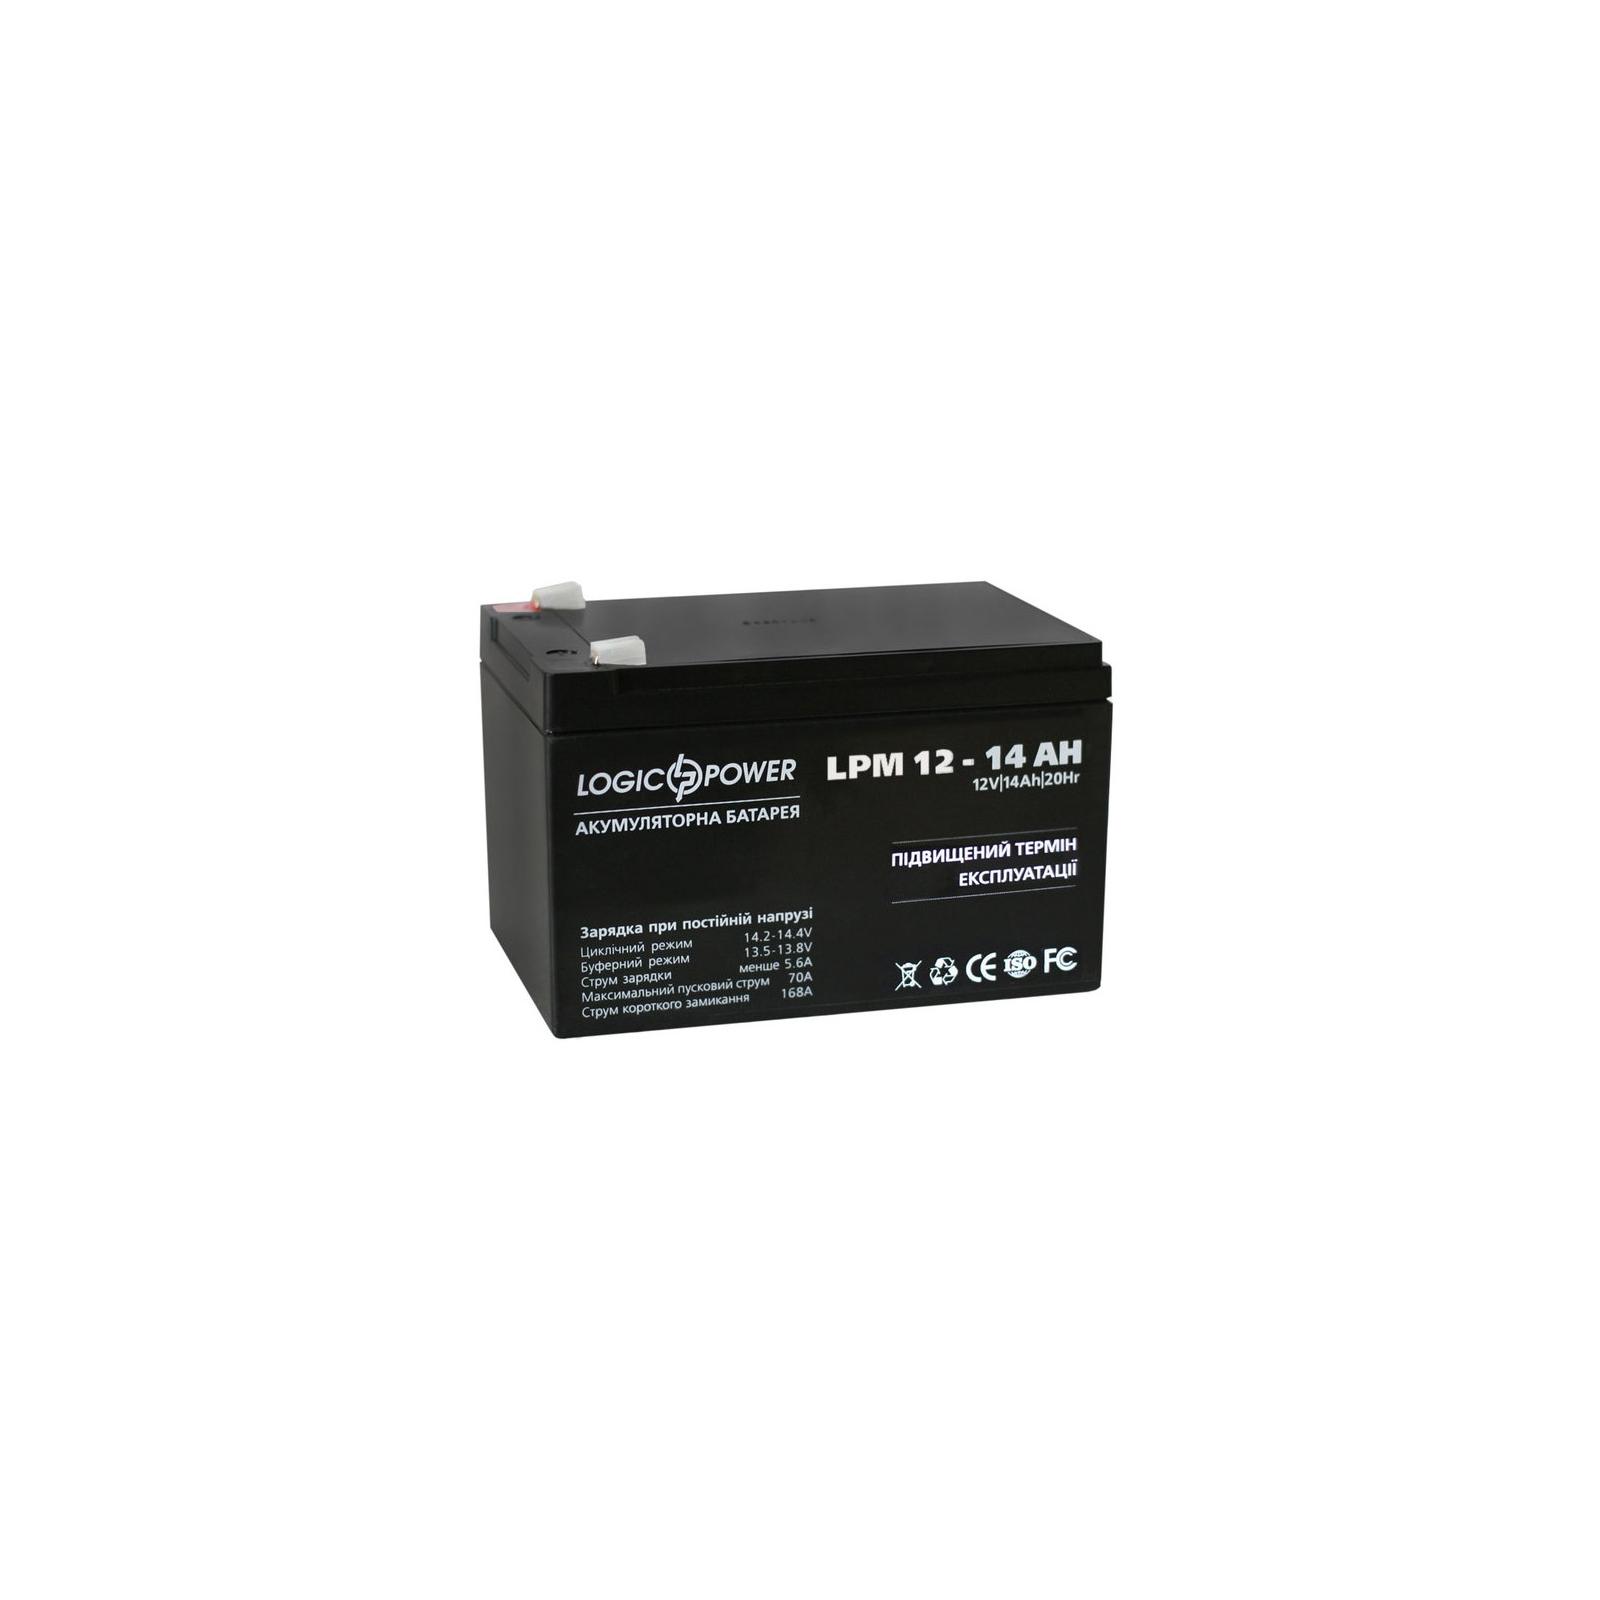 Батарея к ИБП LogicPower LPM 12В 14Ач (4161) изображение 2